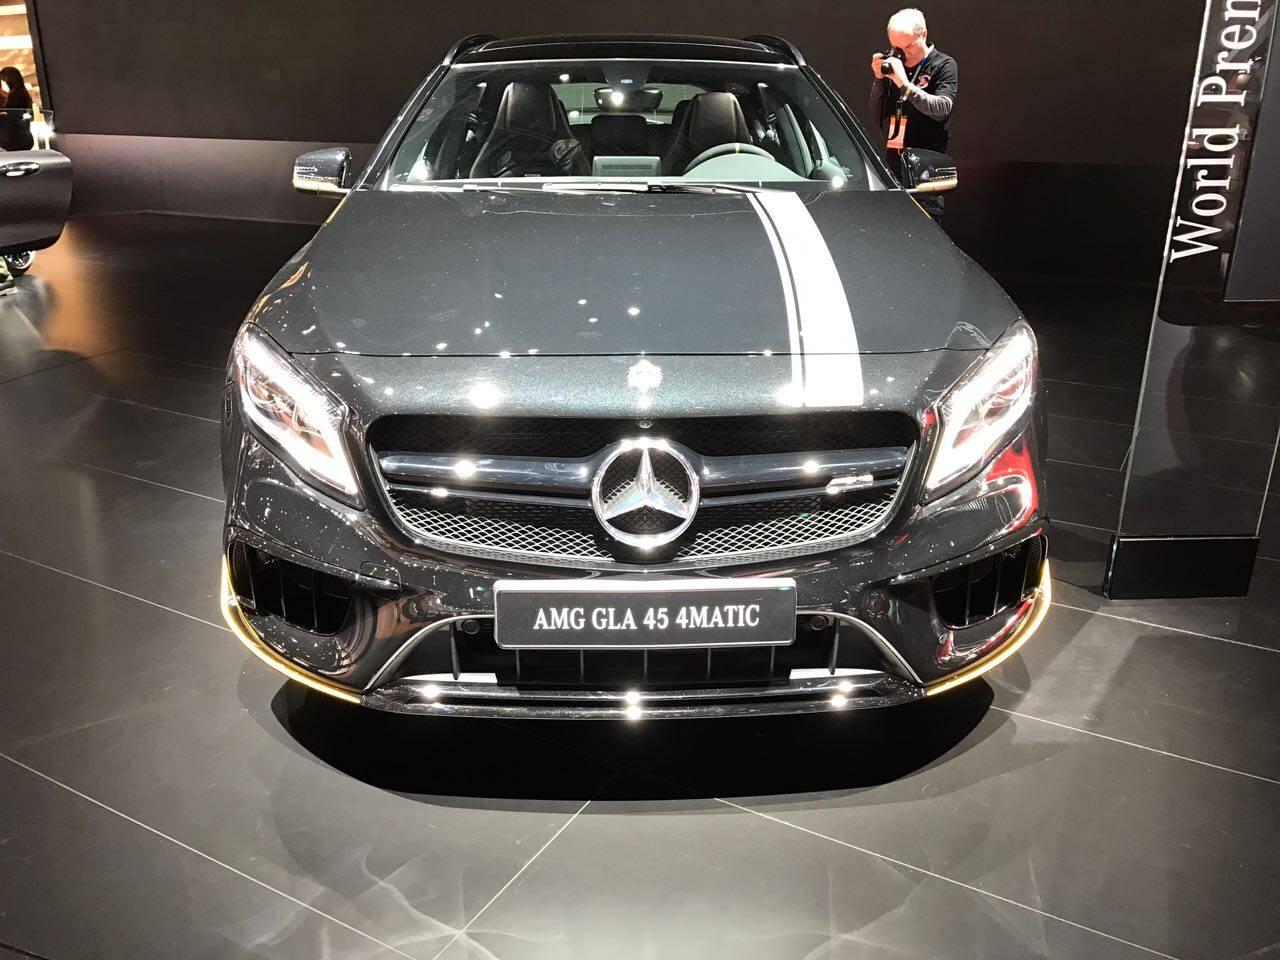 Mercedes-Benz GLA. Foto: André Jalonetsky/iG Carros